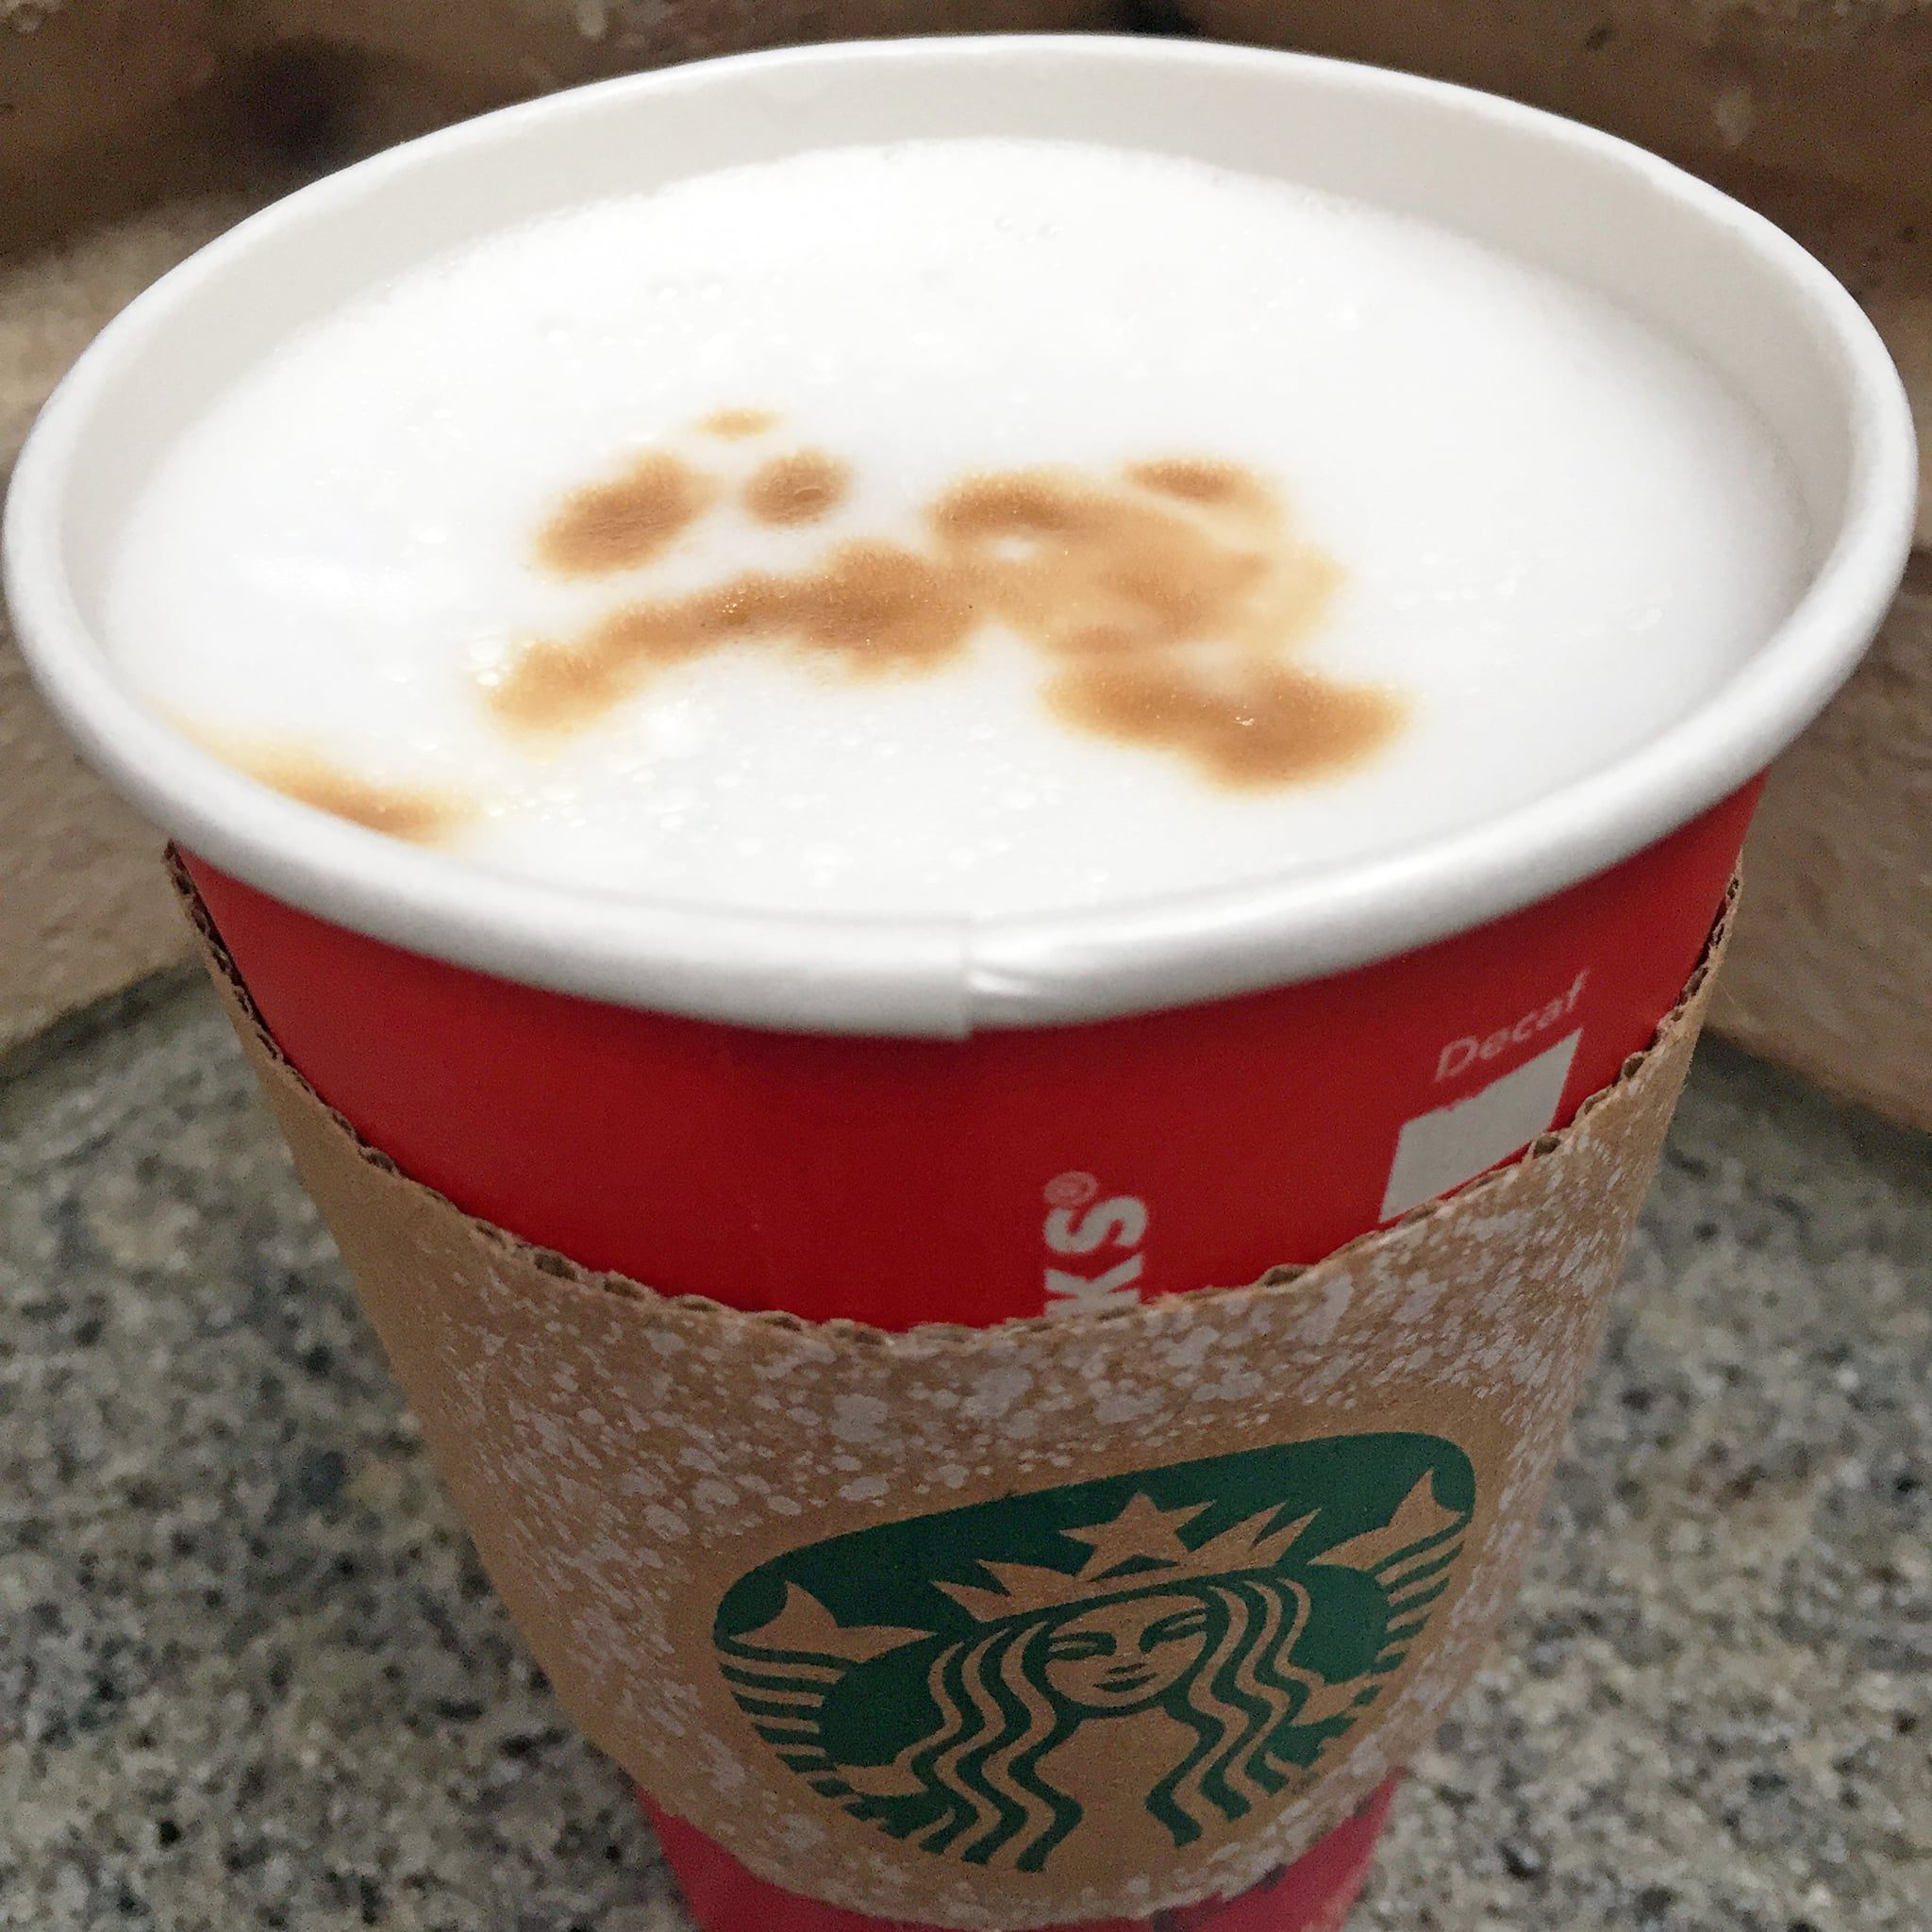 starbucks latte macchiato review popsugar food